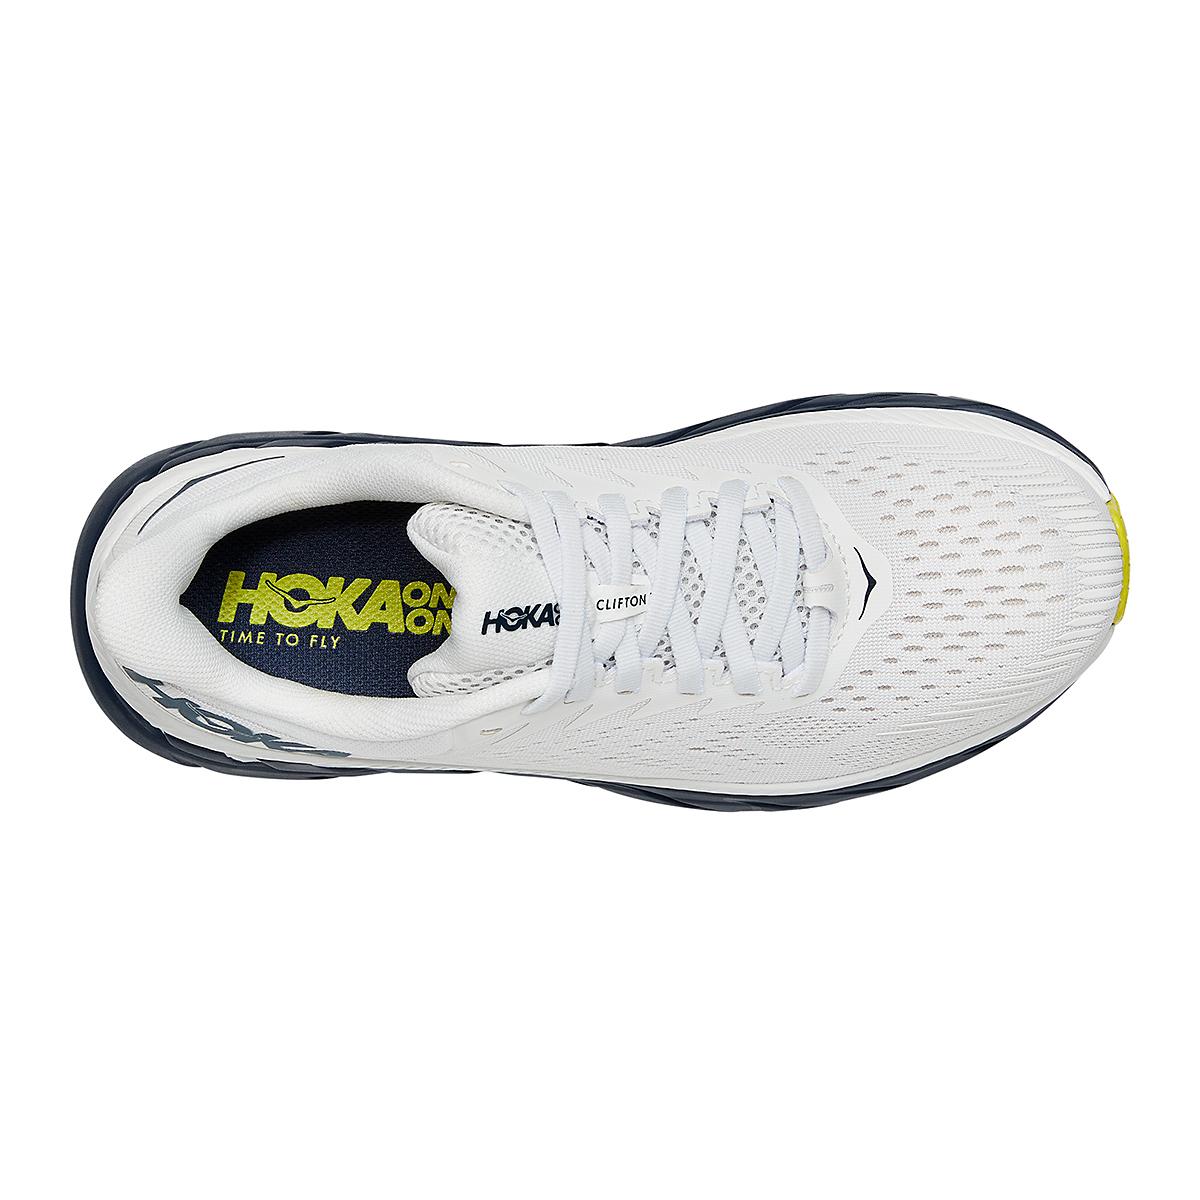 Men's Hoka One One Clifton 7 Running Shoe - Color: Blanc De Blanc - Size: 7 - Width: Regular, Blanc De Blanc, large, image 3